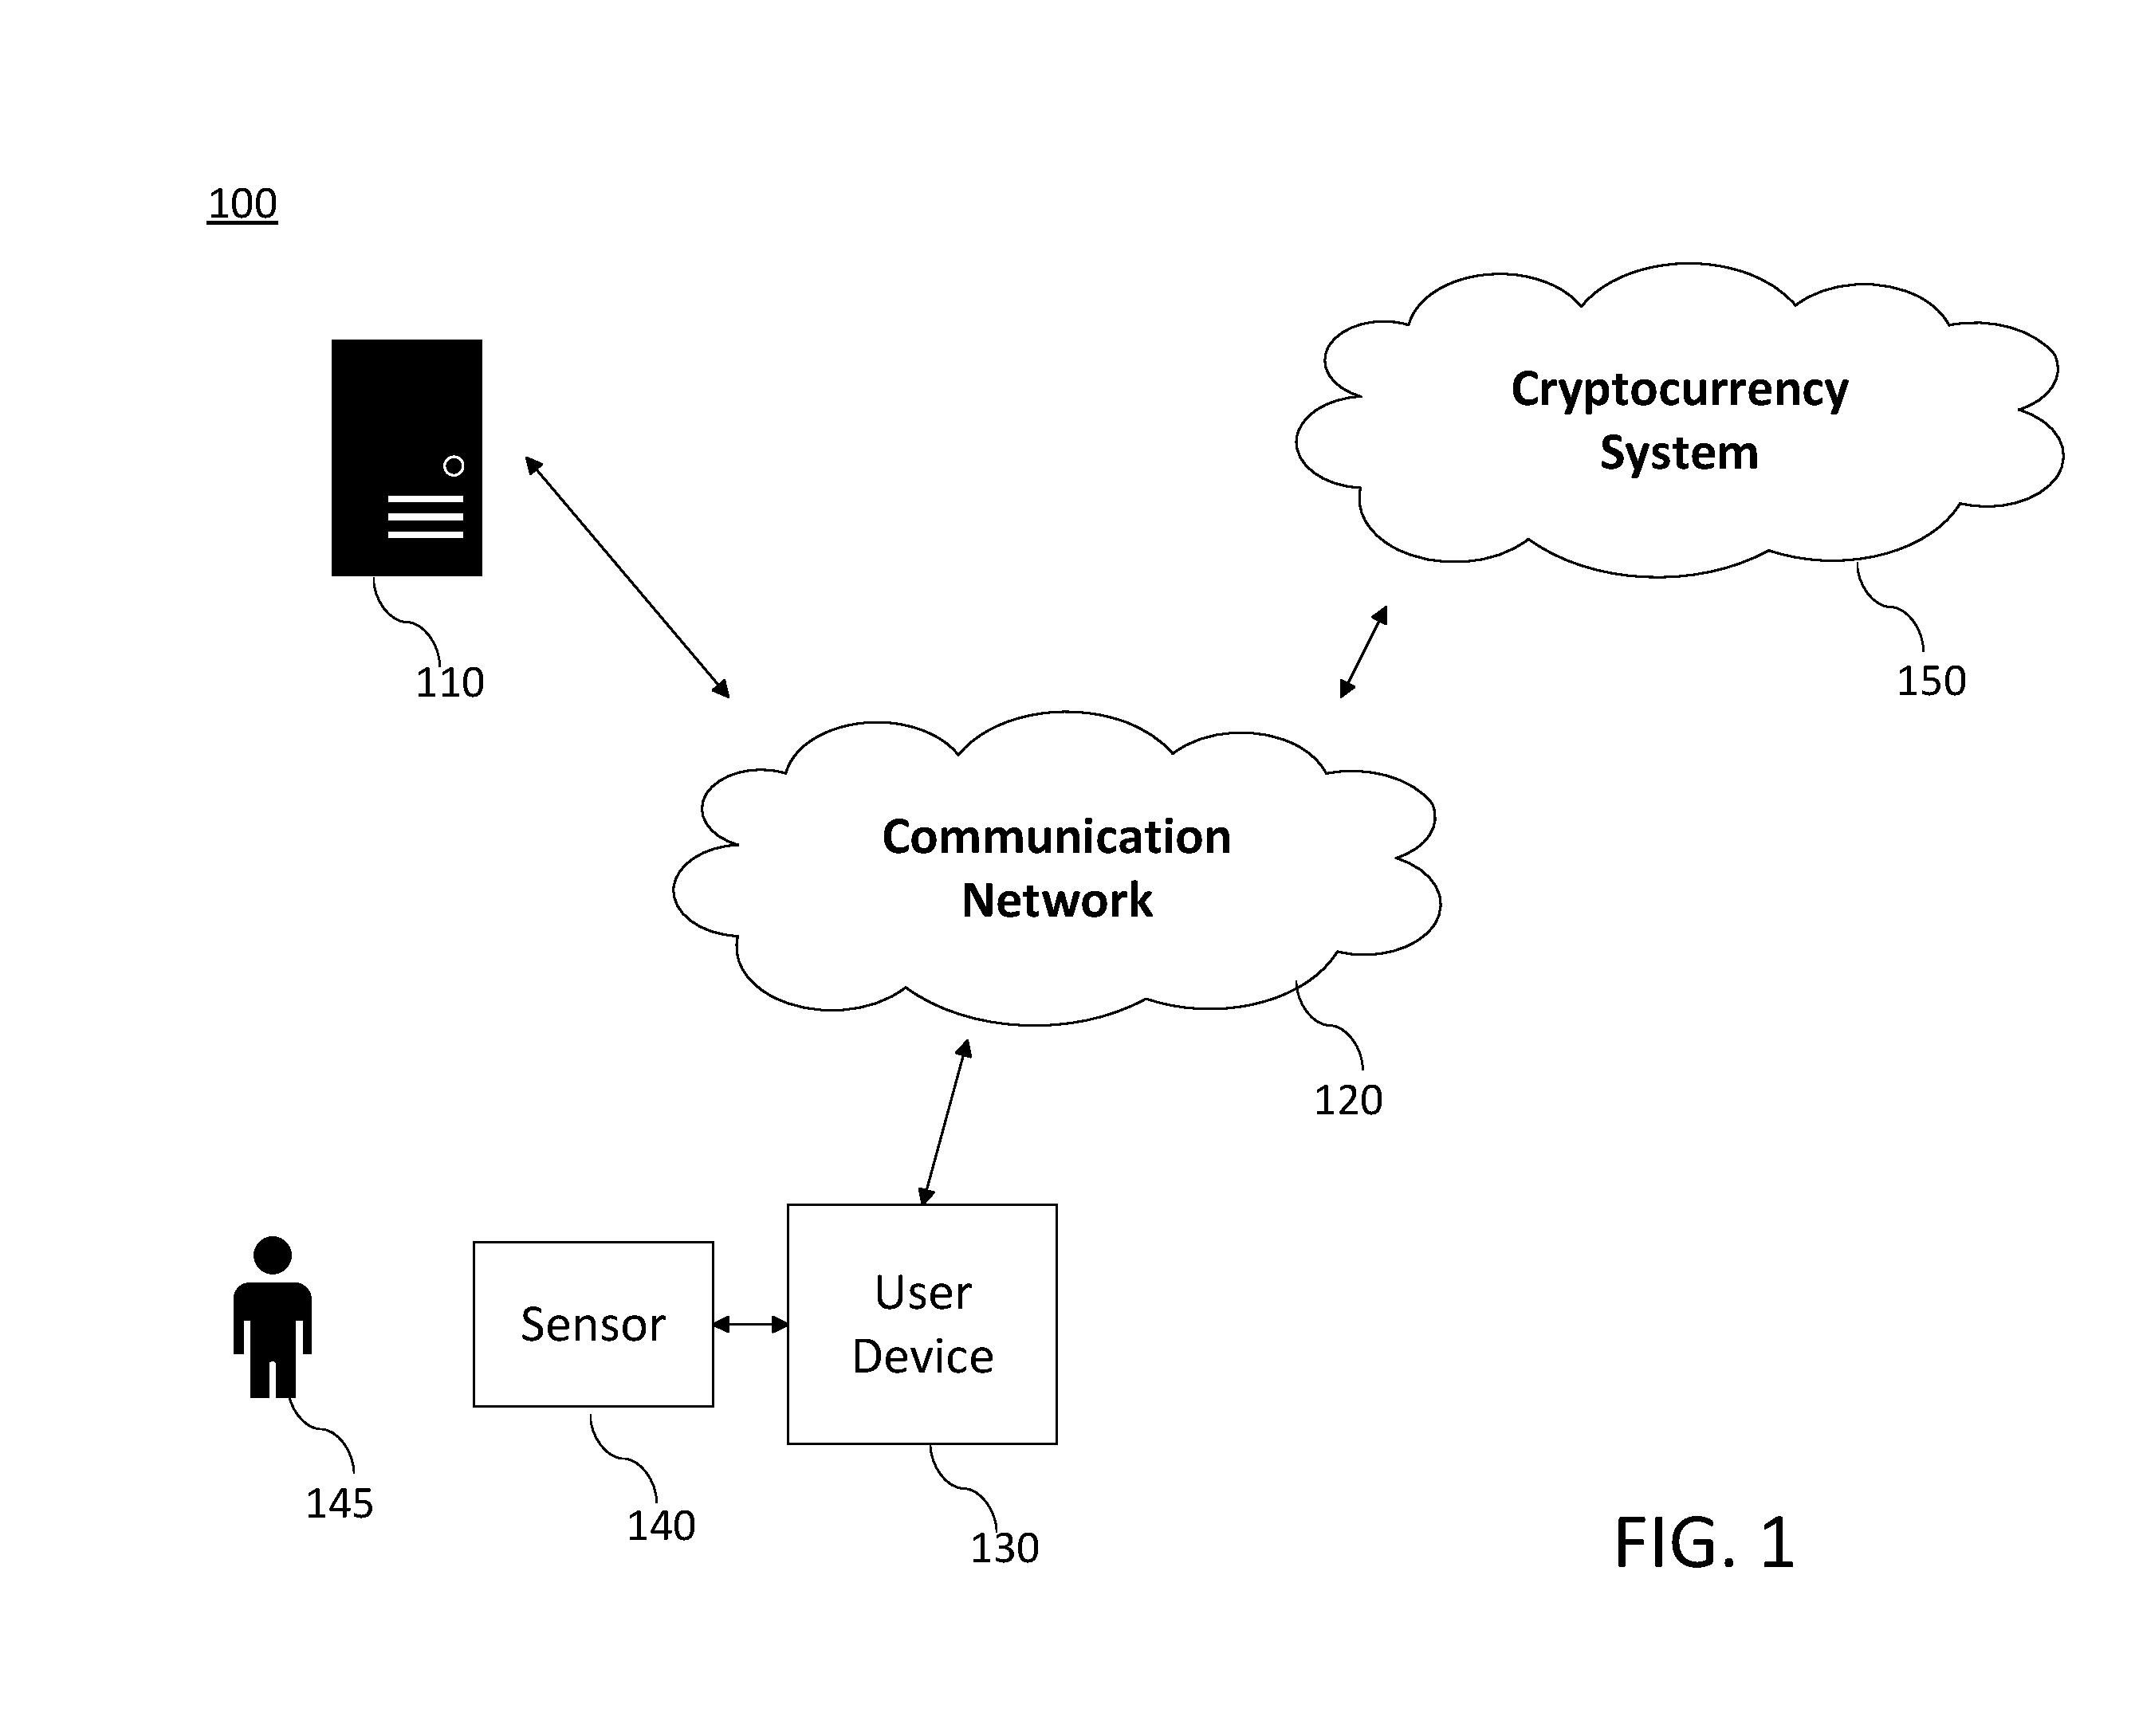 microsoft cryptocurrency patent diagram 1